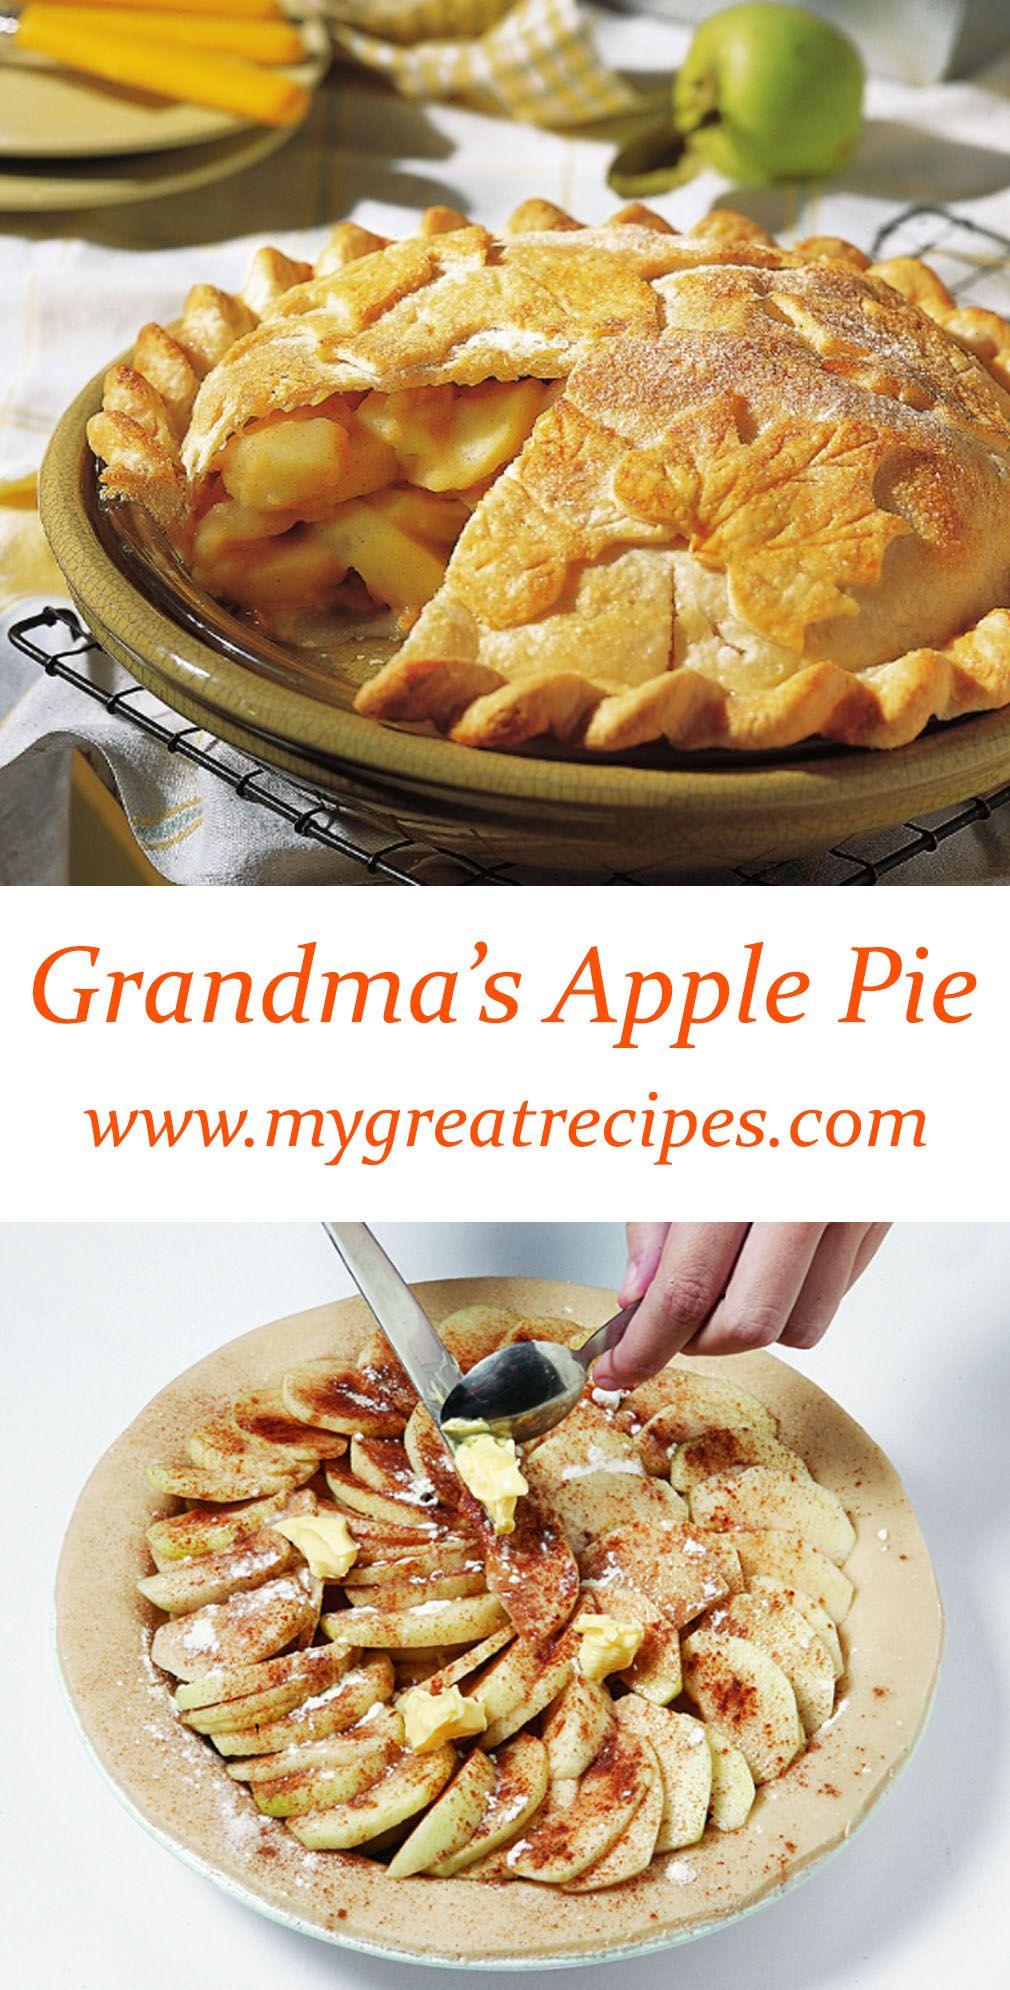 Grandma's Apple Pie A touch of #lemon in the fillin